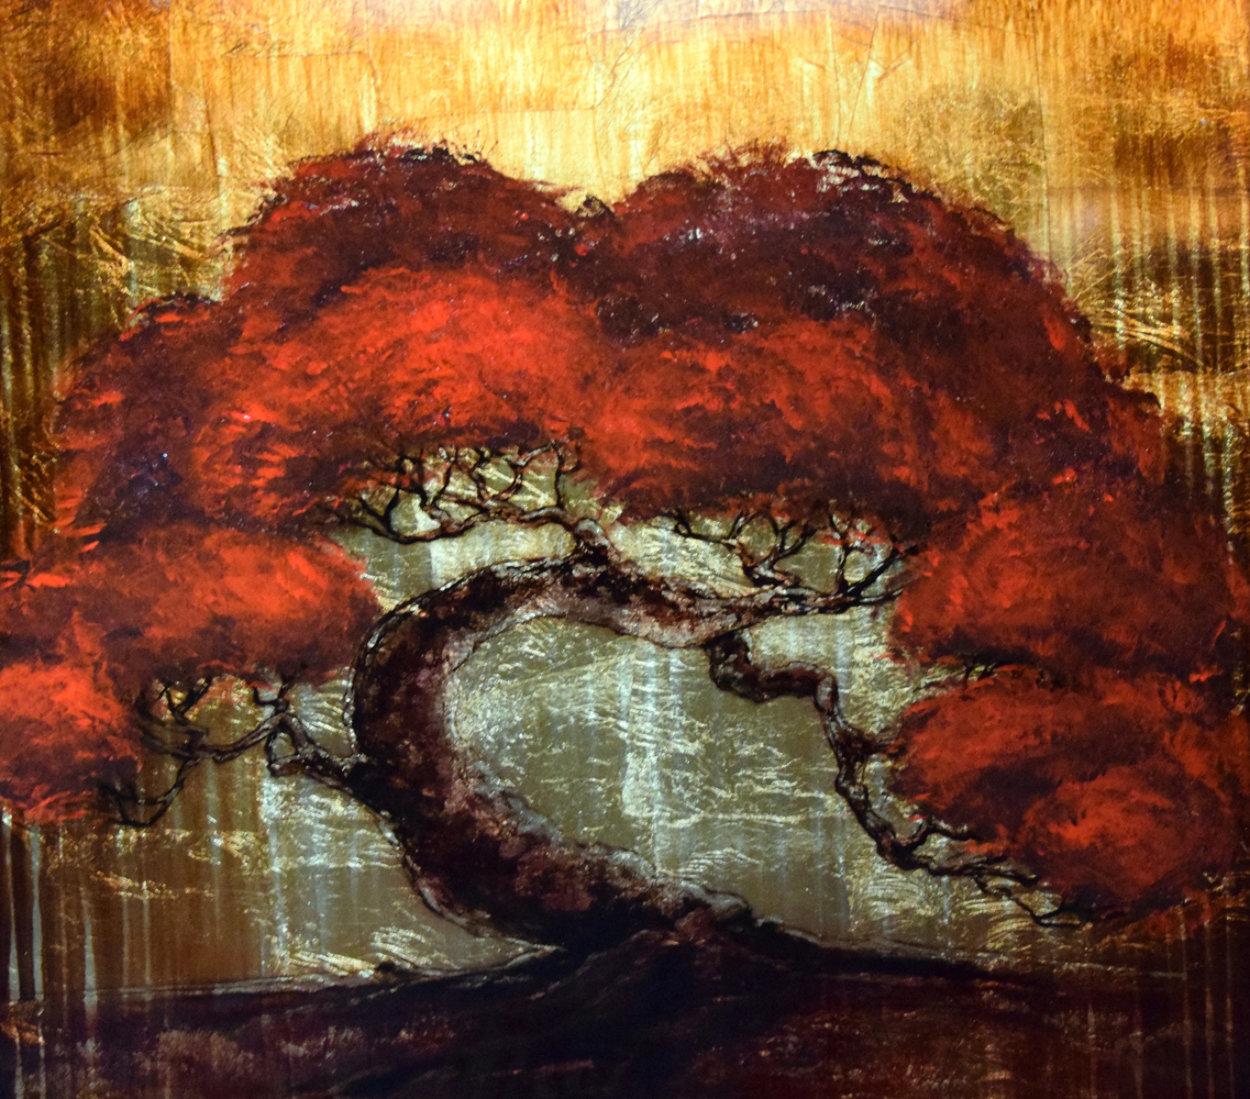 Gold Tree 2013 30x30 Original Painting by Patrick Guyton